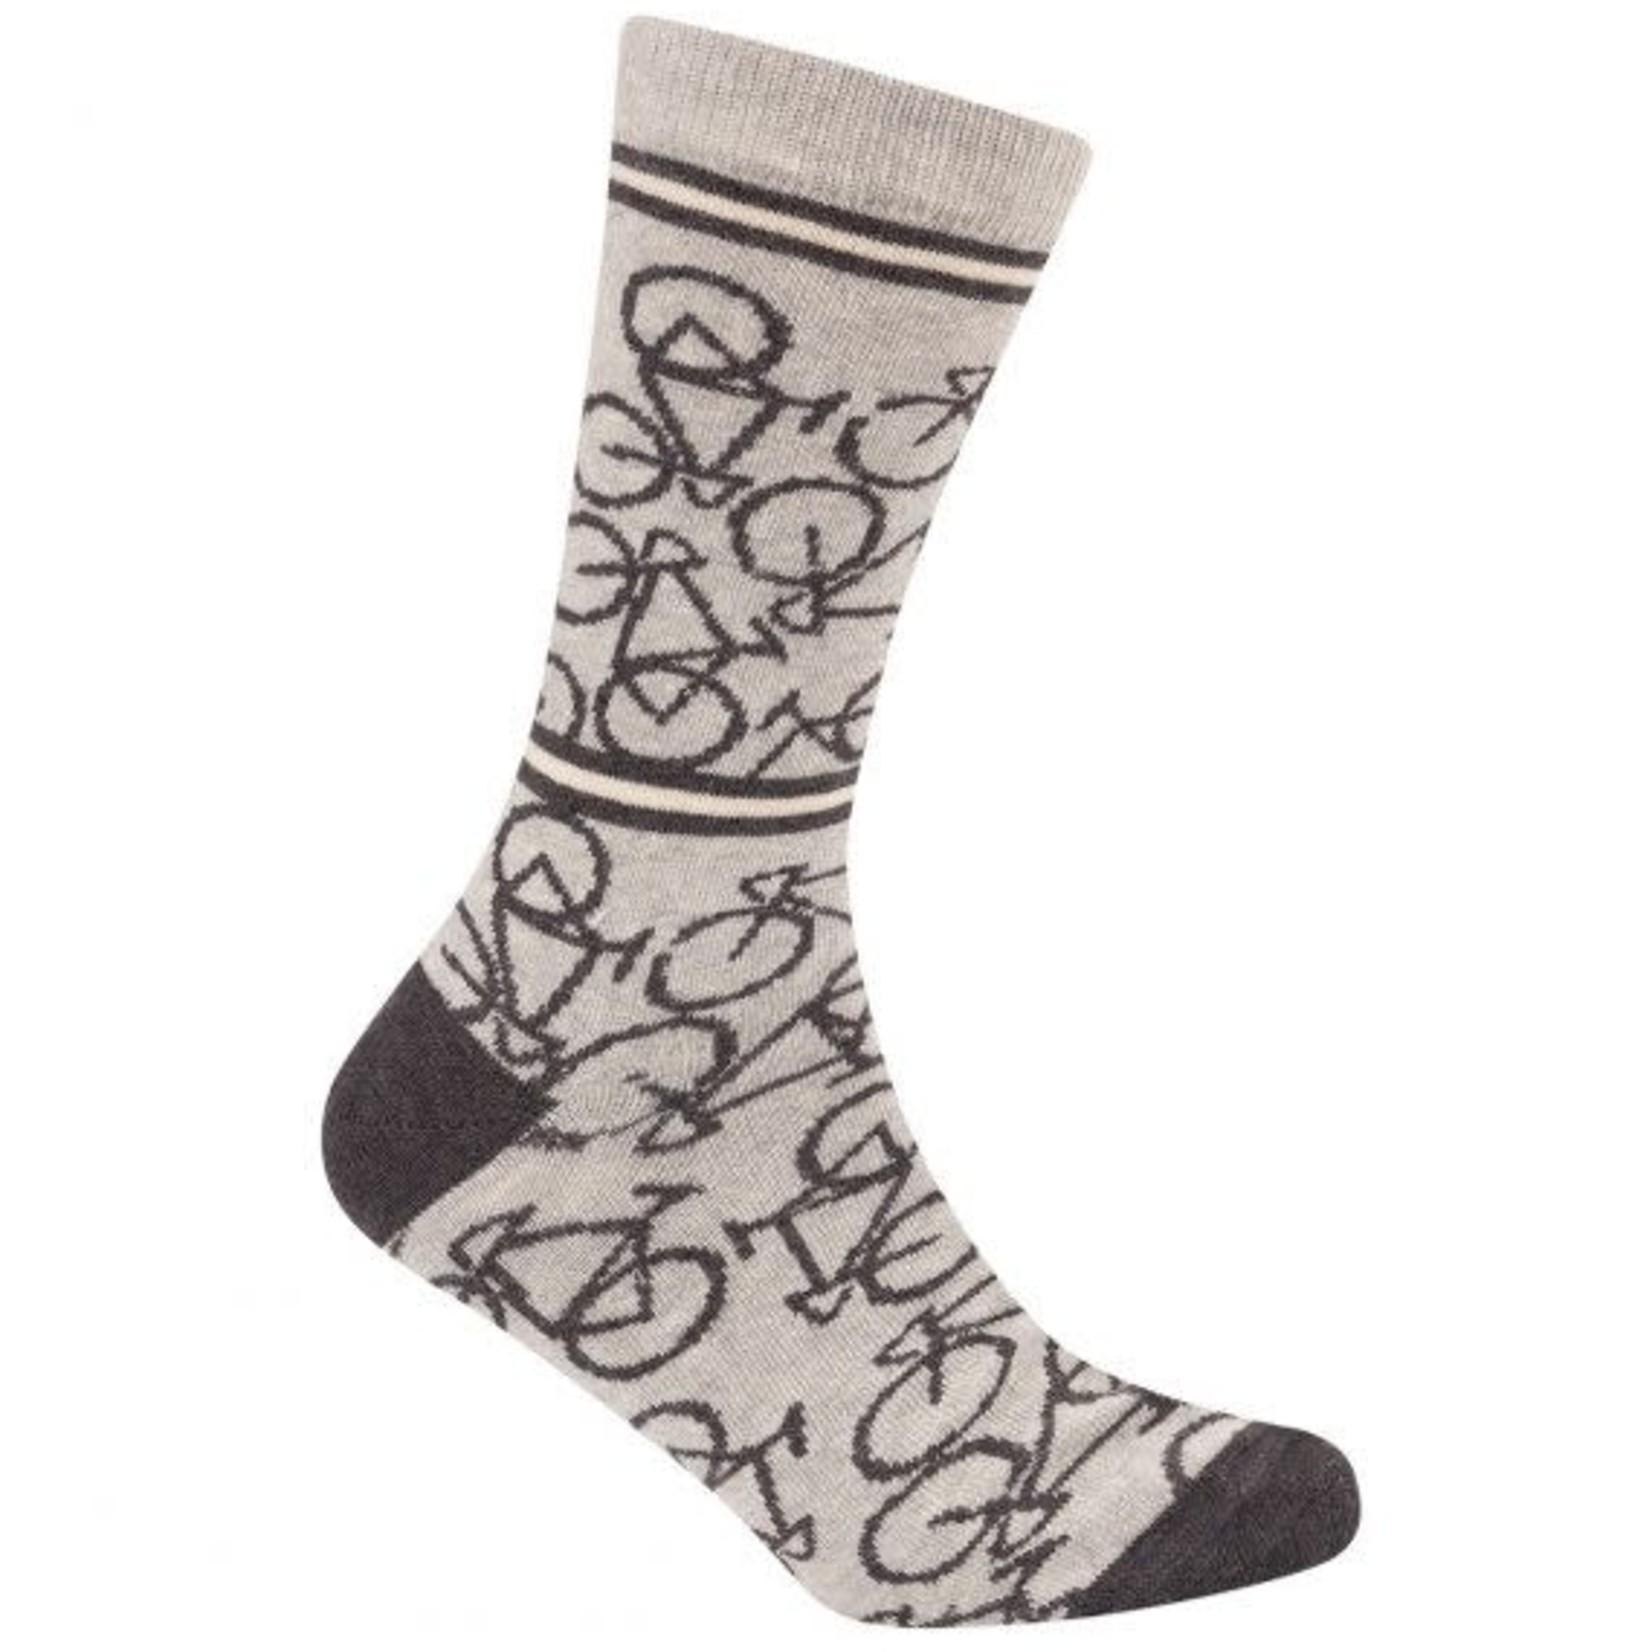 Sokken 'Le Patron' Bicycle socks lichtgrijs